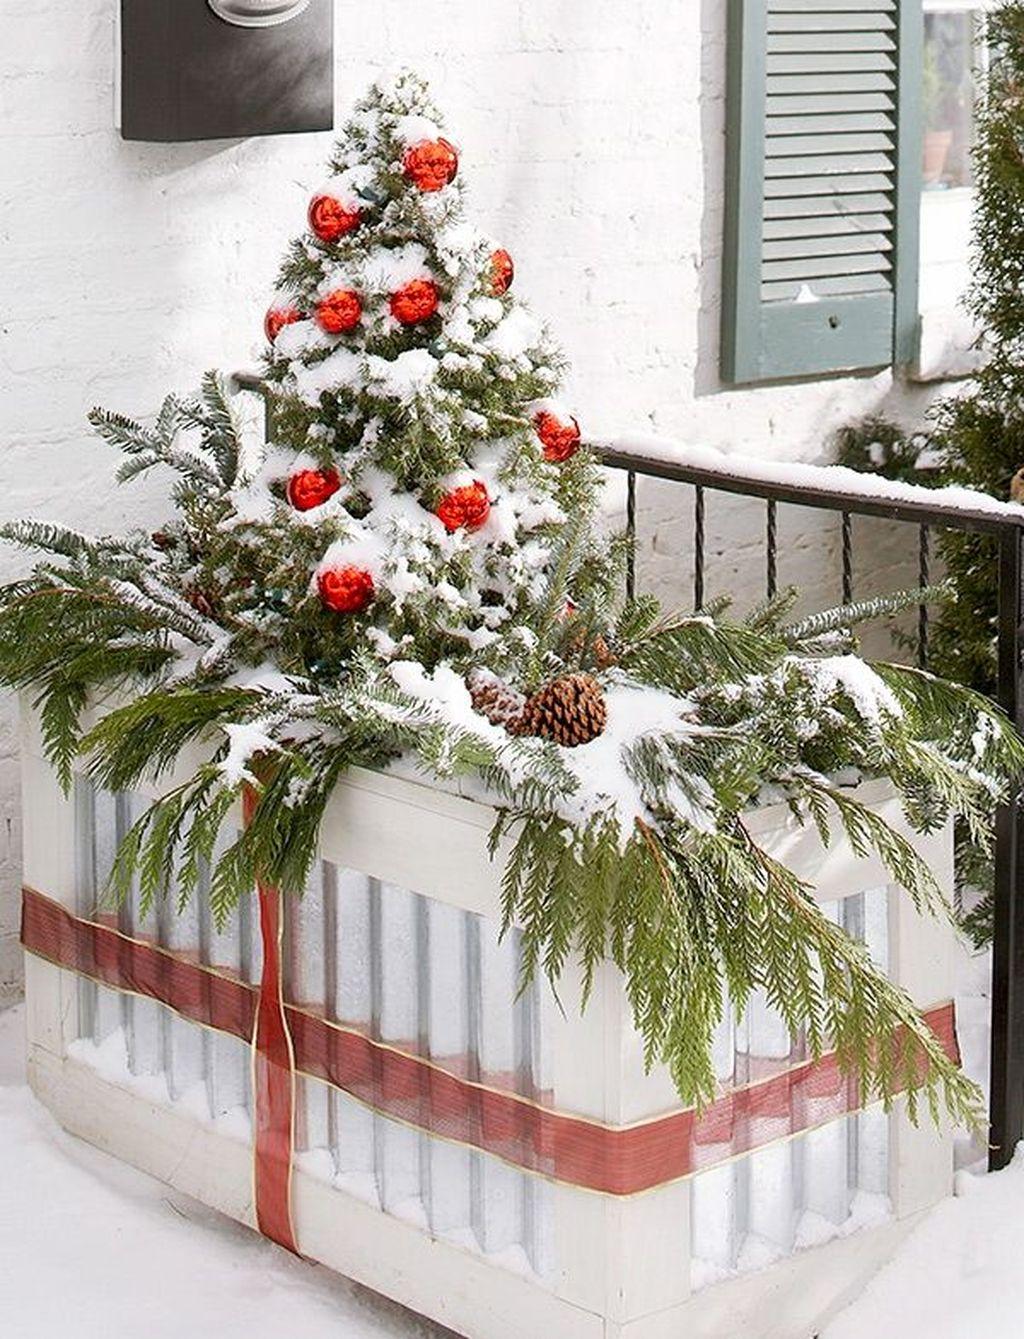 Inspiring Winter Container Gardening Ideas 24